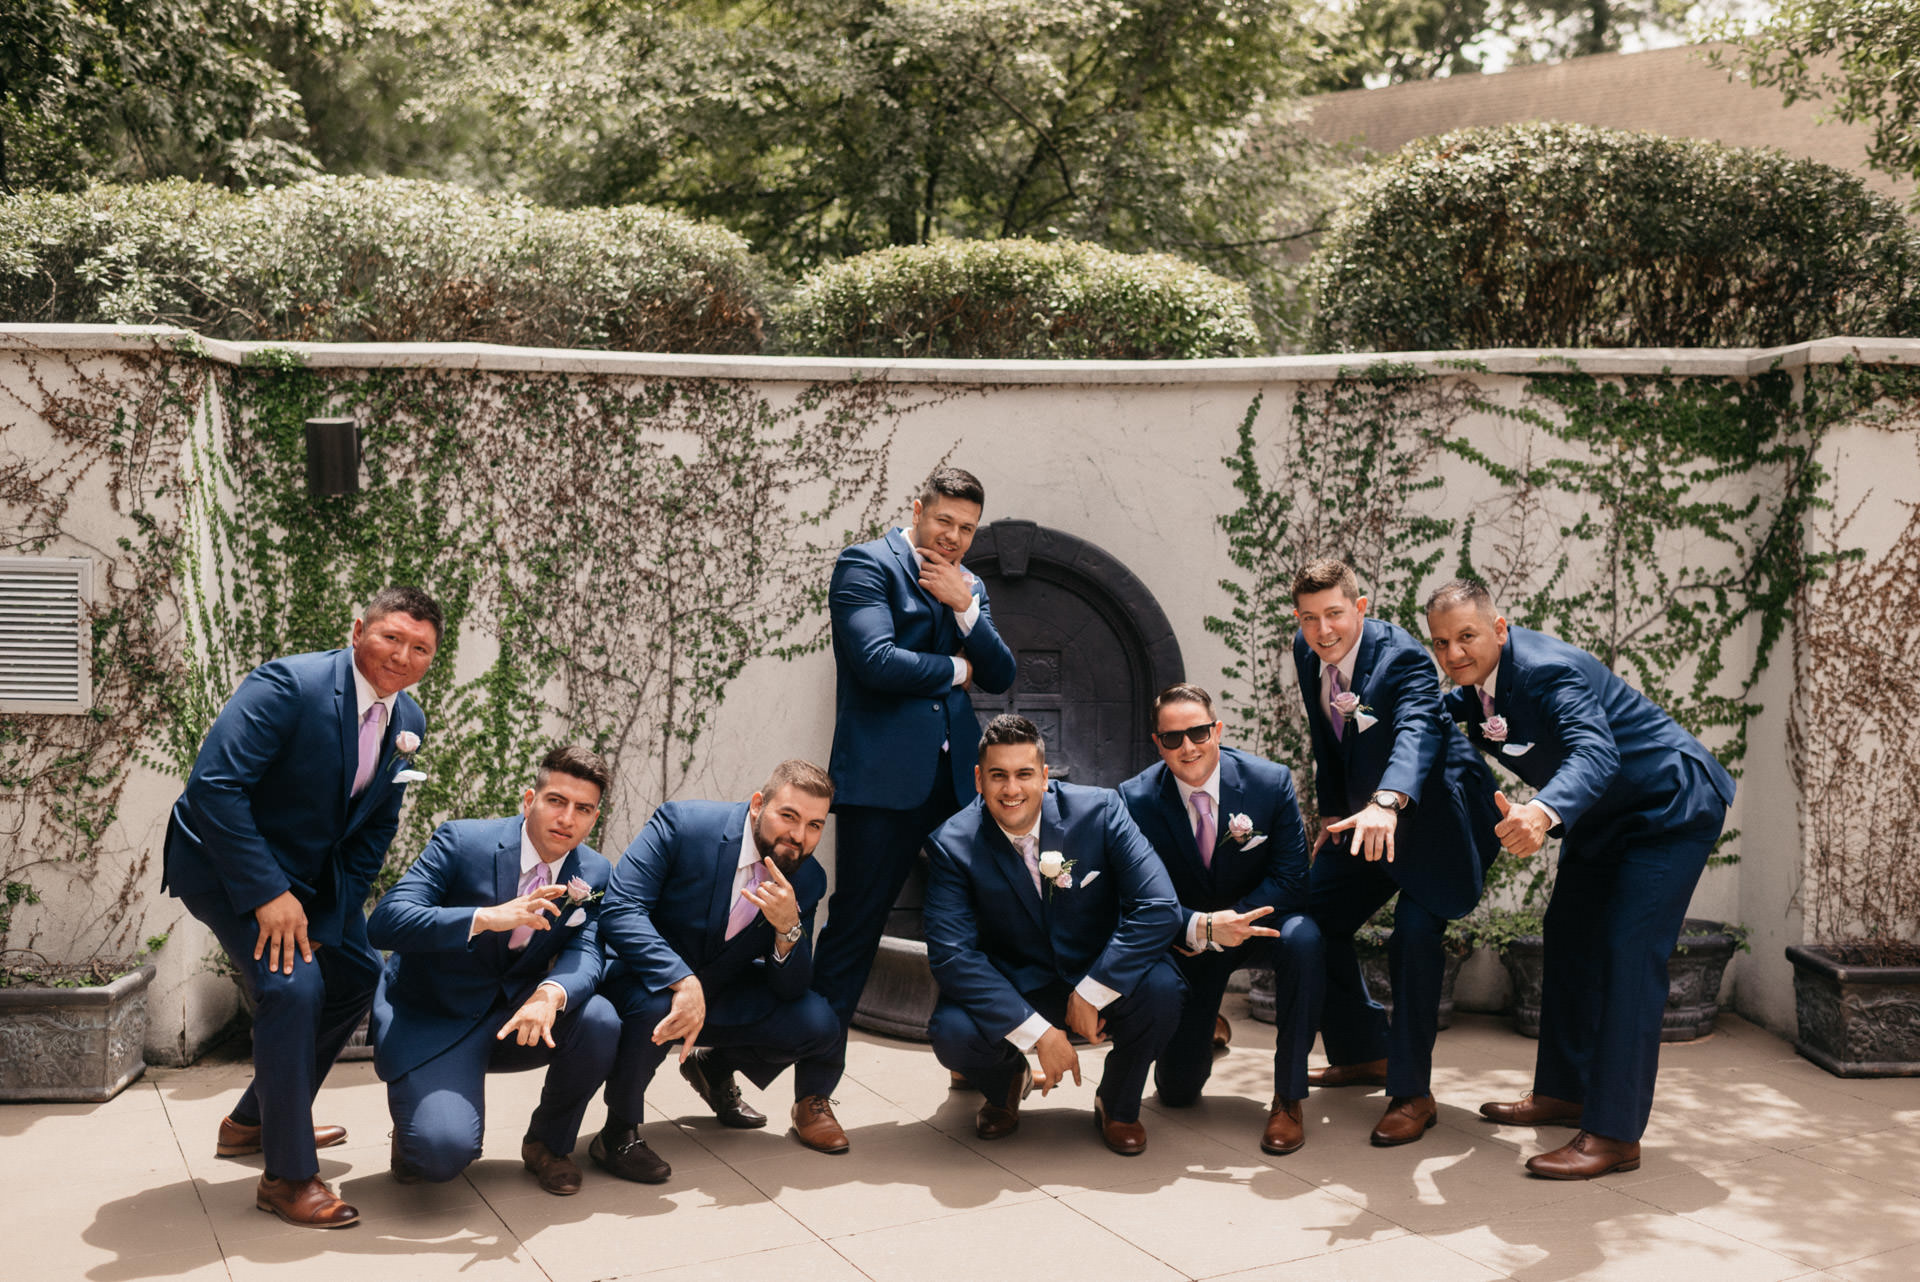 lexi-michael-wedding-blog-sm-38.jpg